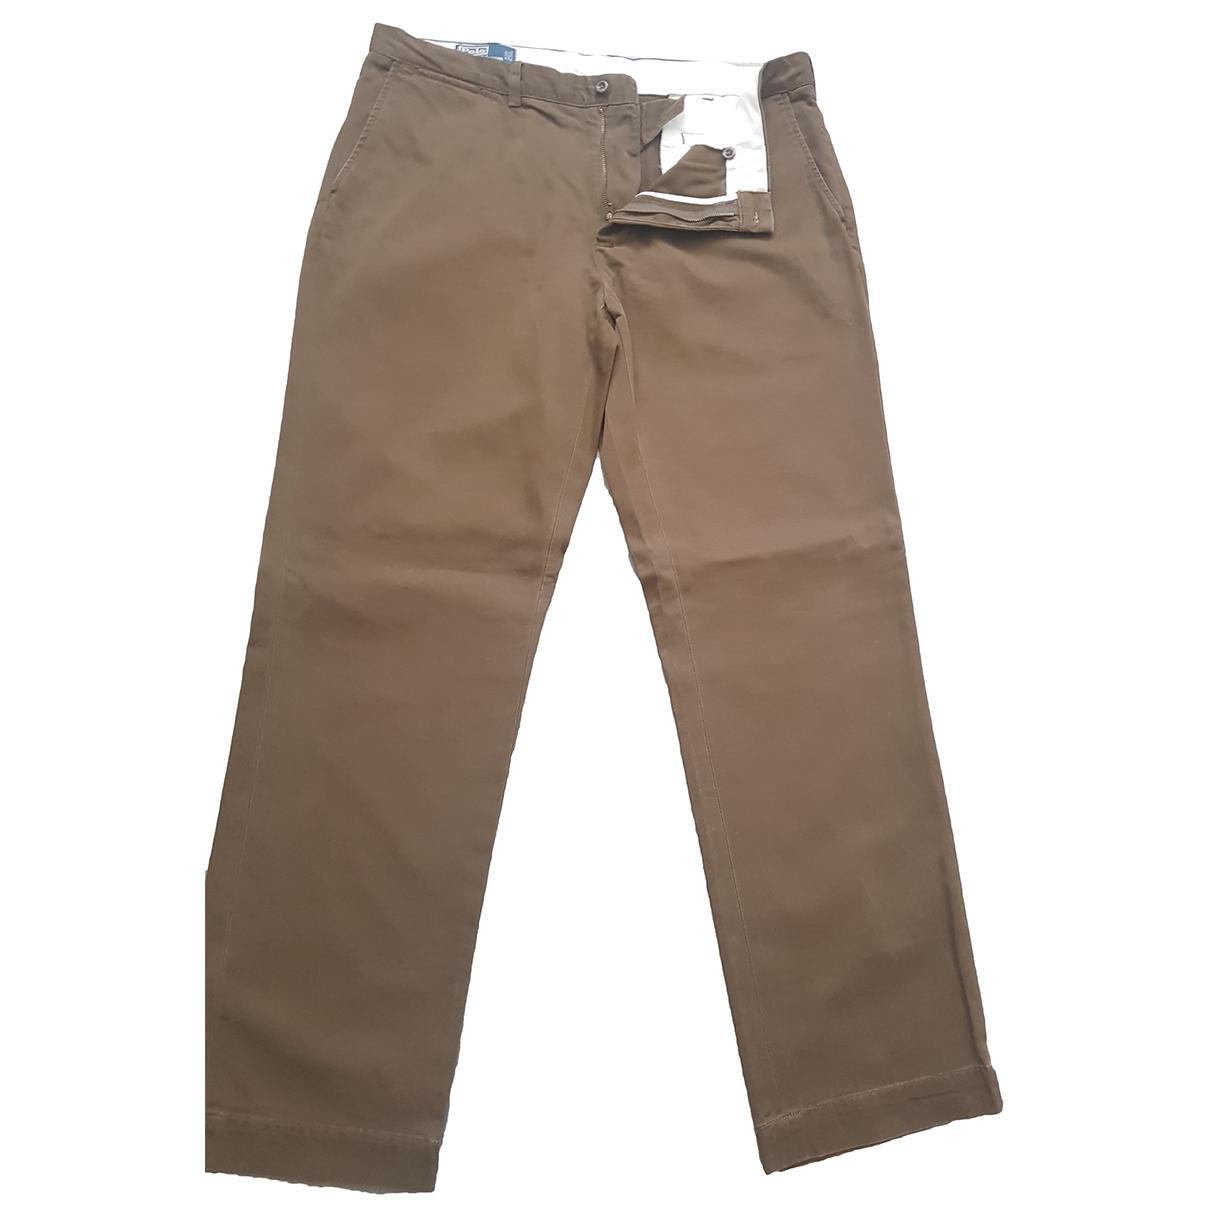 Pantalones en Algodon Marron Polo Ralph Lauren